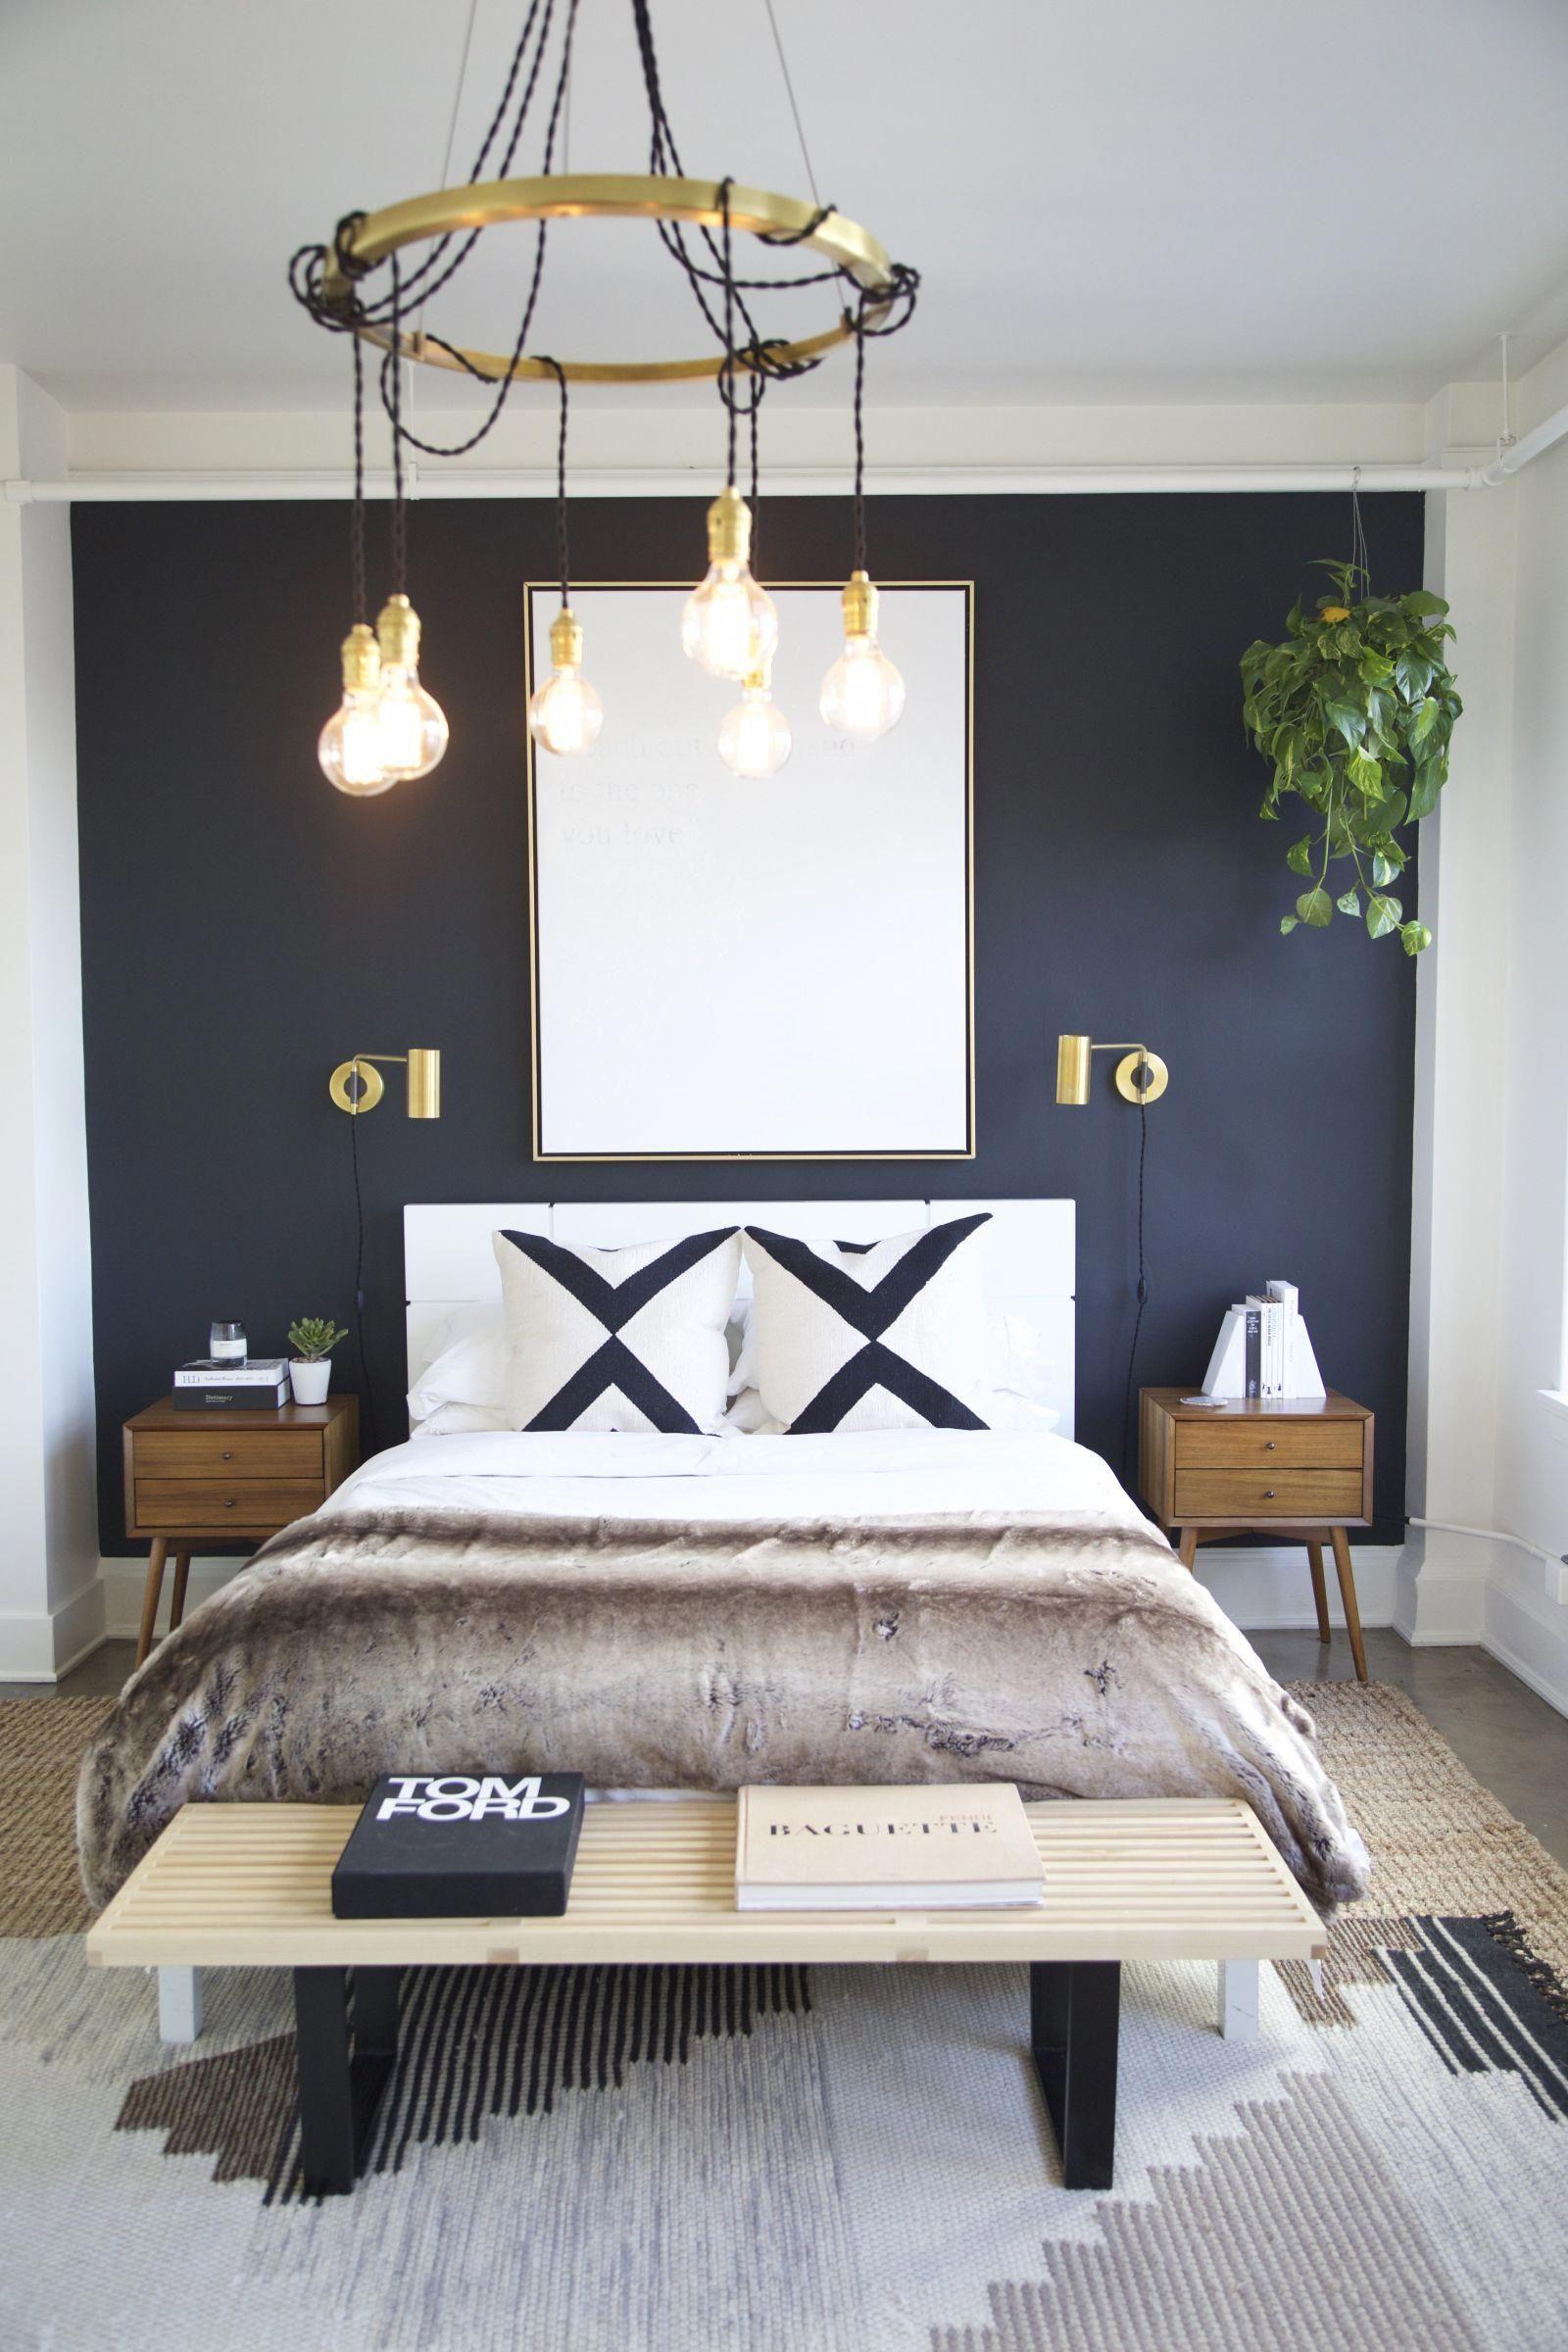 Go Inside 5 Of The Dreamiest Lofts In America Dark Blue Bedroom Walls Blue Bedroom Walls Blue Accent Walls